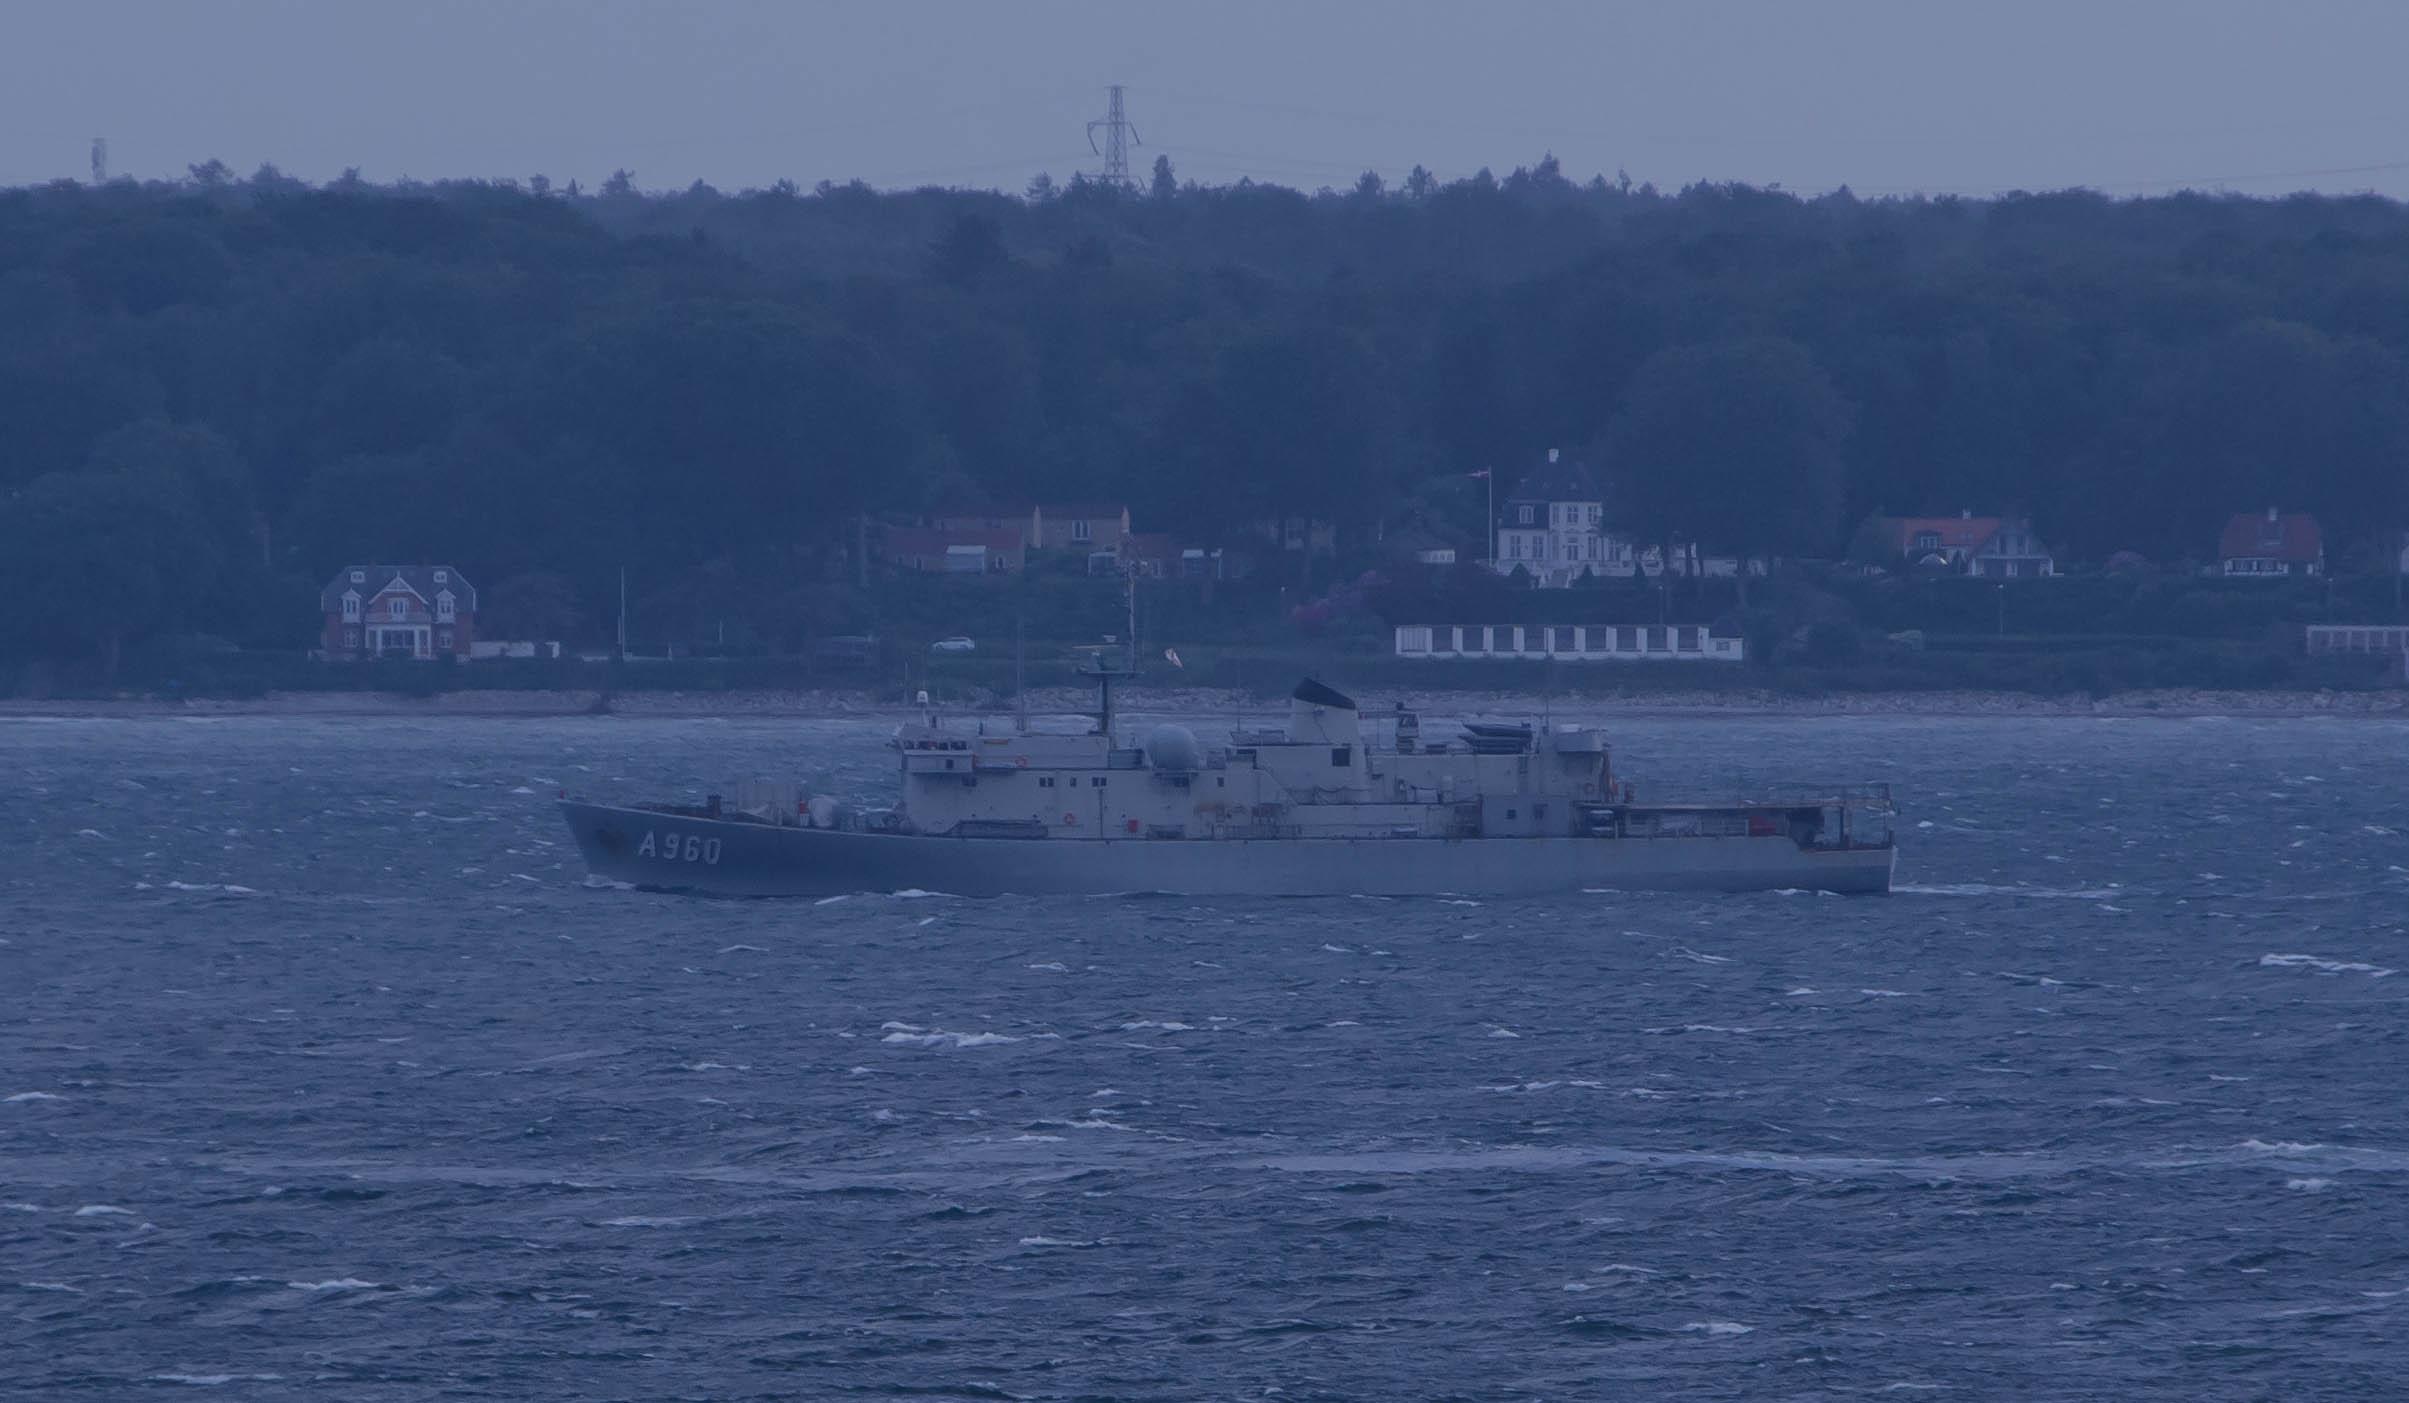 3 navires belges prendront part à l'exercice BALTOPS 2017 34863750922_f170a502c9_o